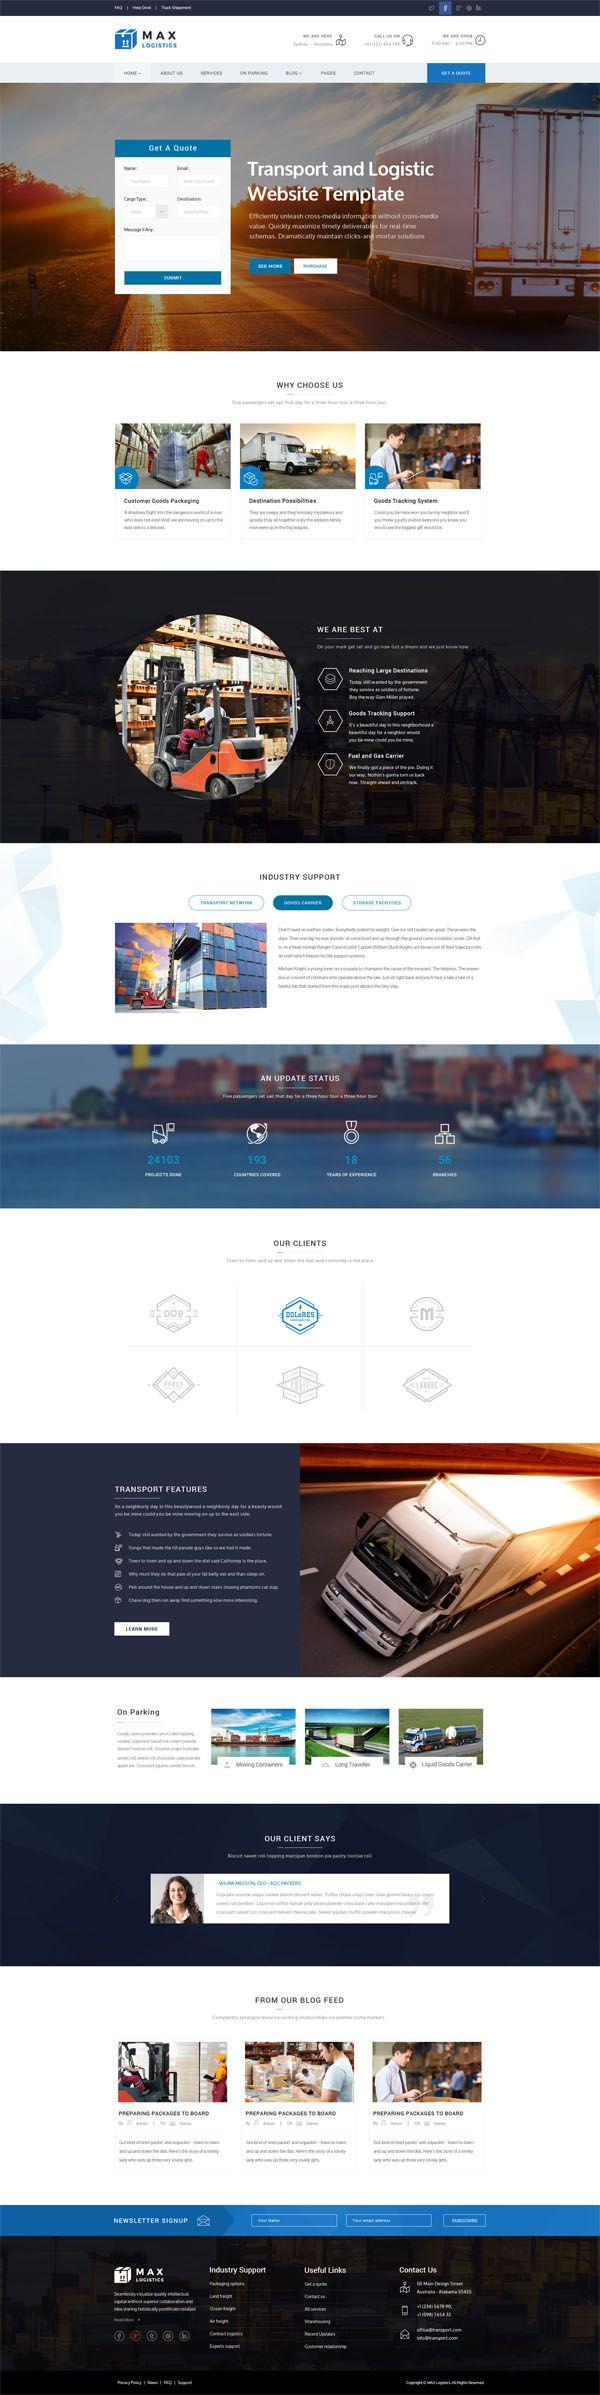 15 Modern Responsive Design HTML5 Website Templates | web